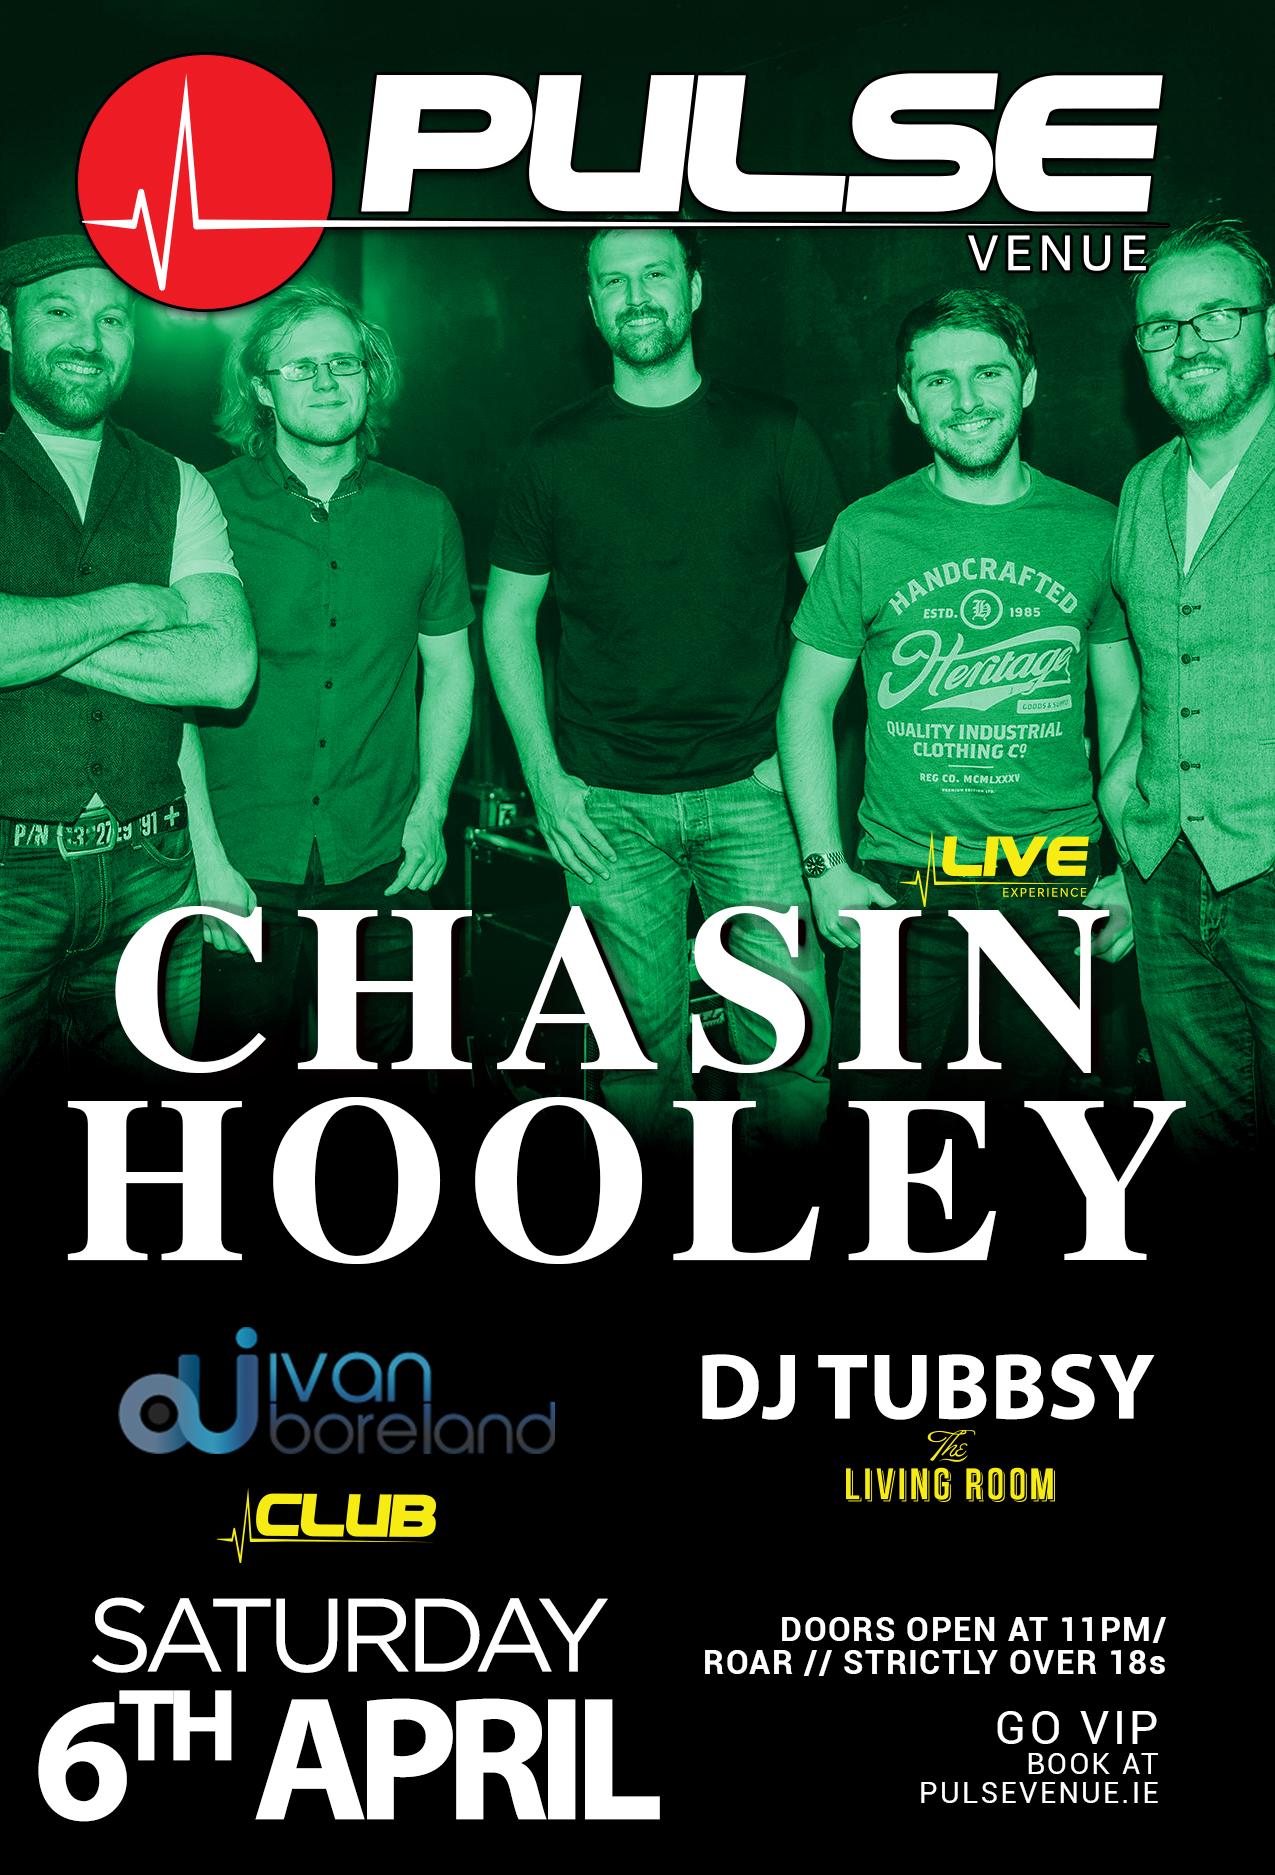 pulse-venue---CHASIN-HOOLEY---ivan-boreland----tubbsy---sat-6-april-2019.jpg